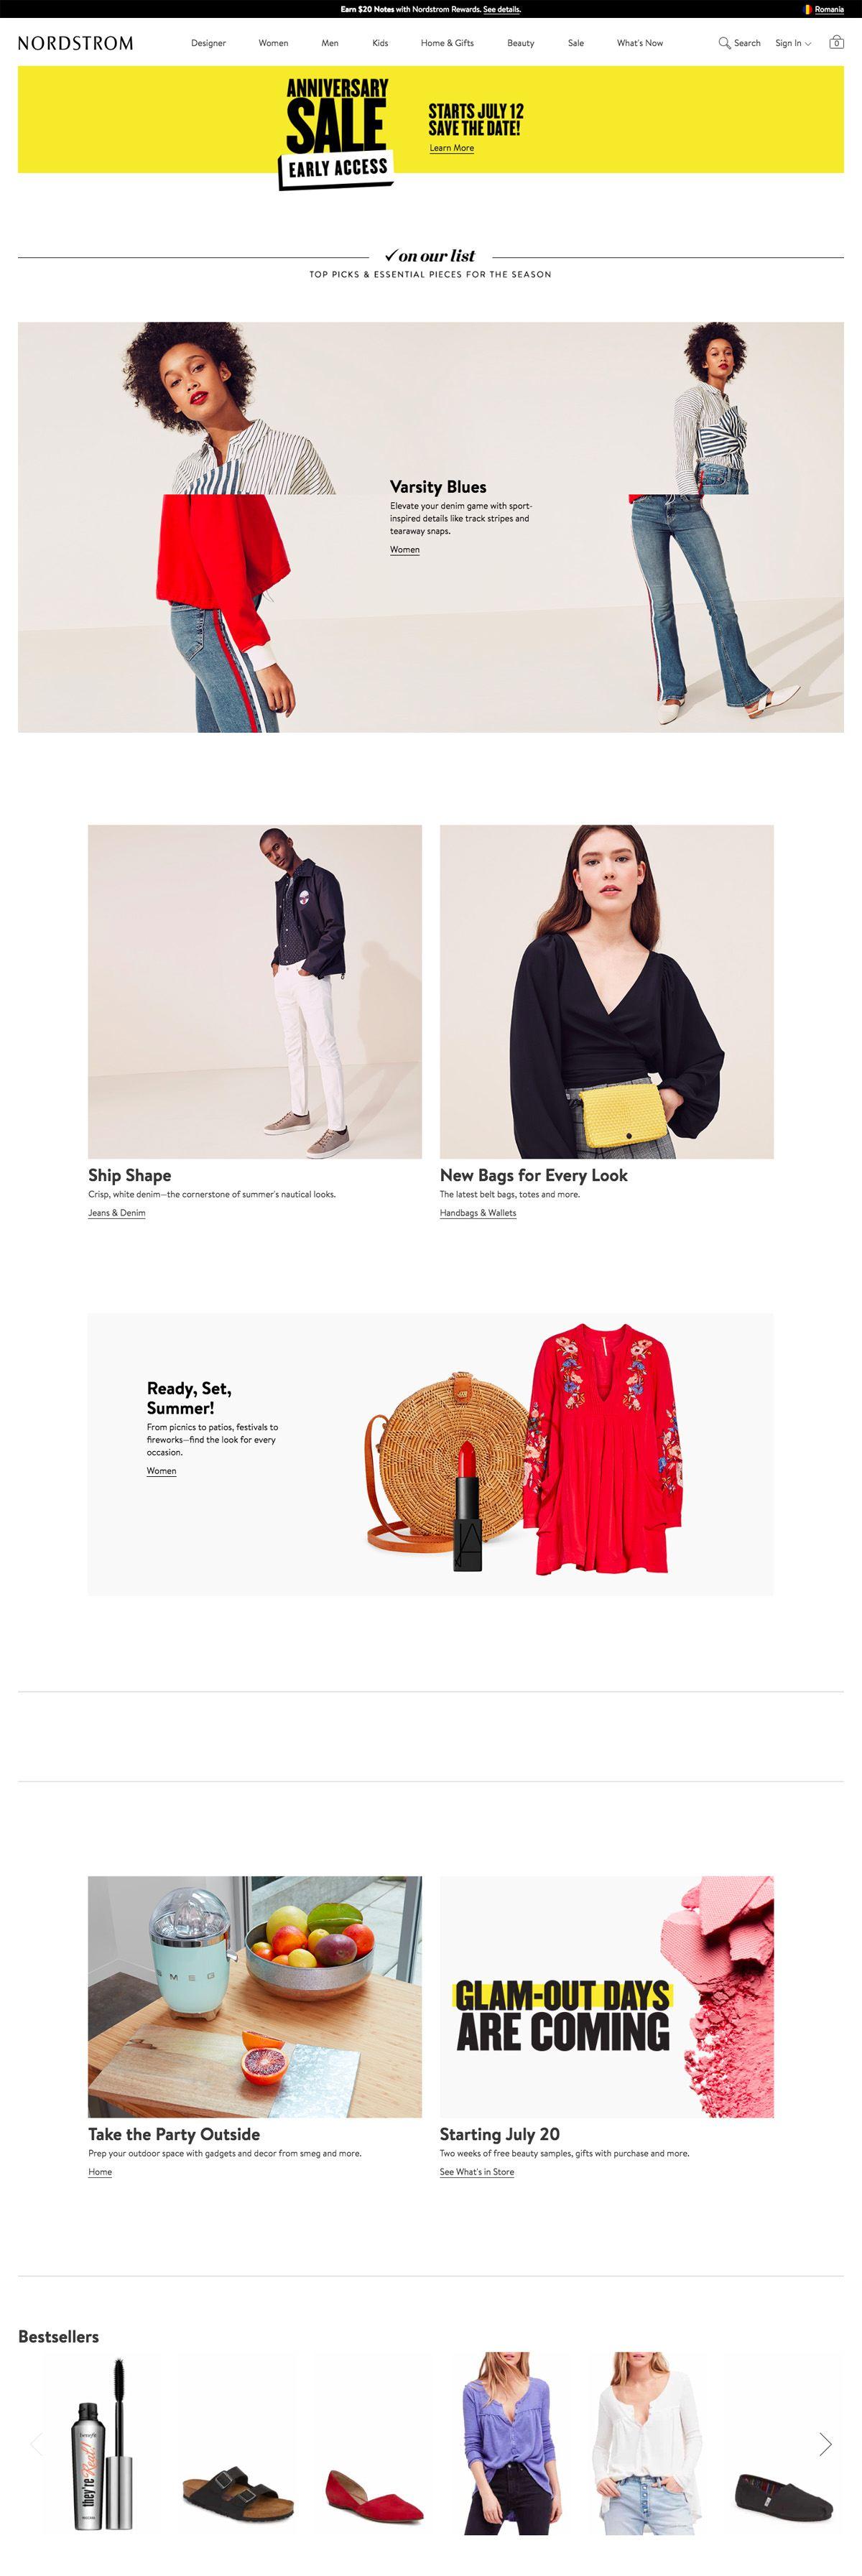 eCommerce website: Nordstrom